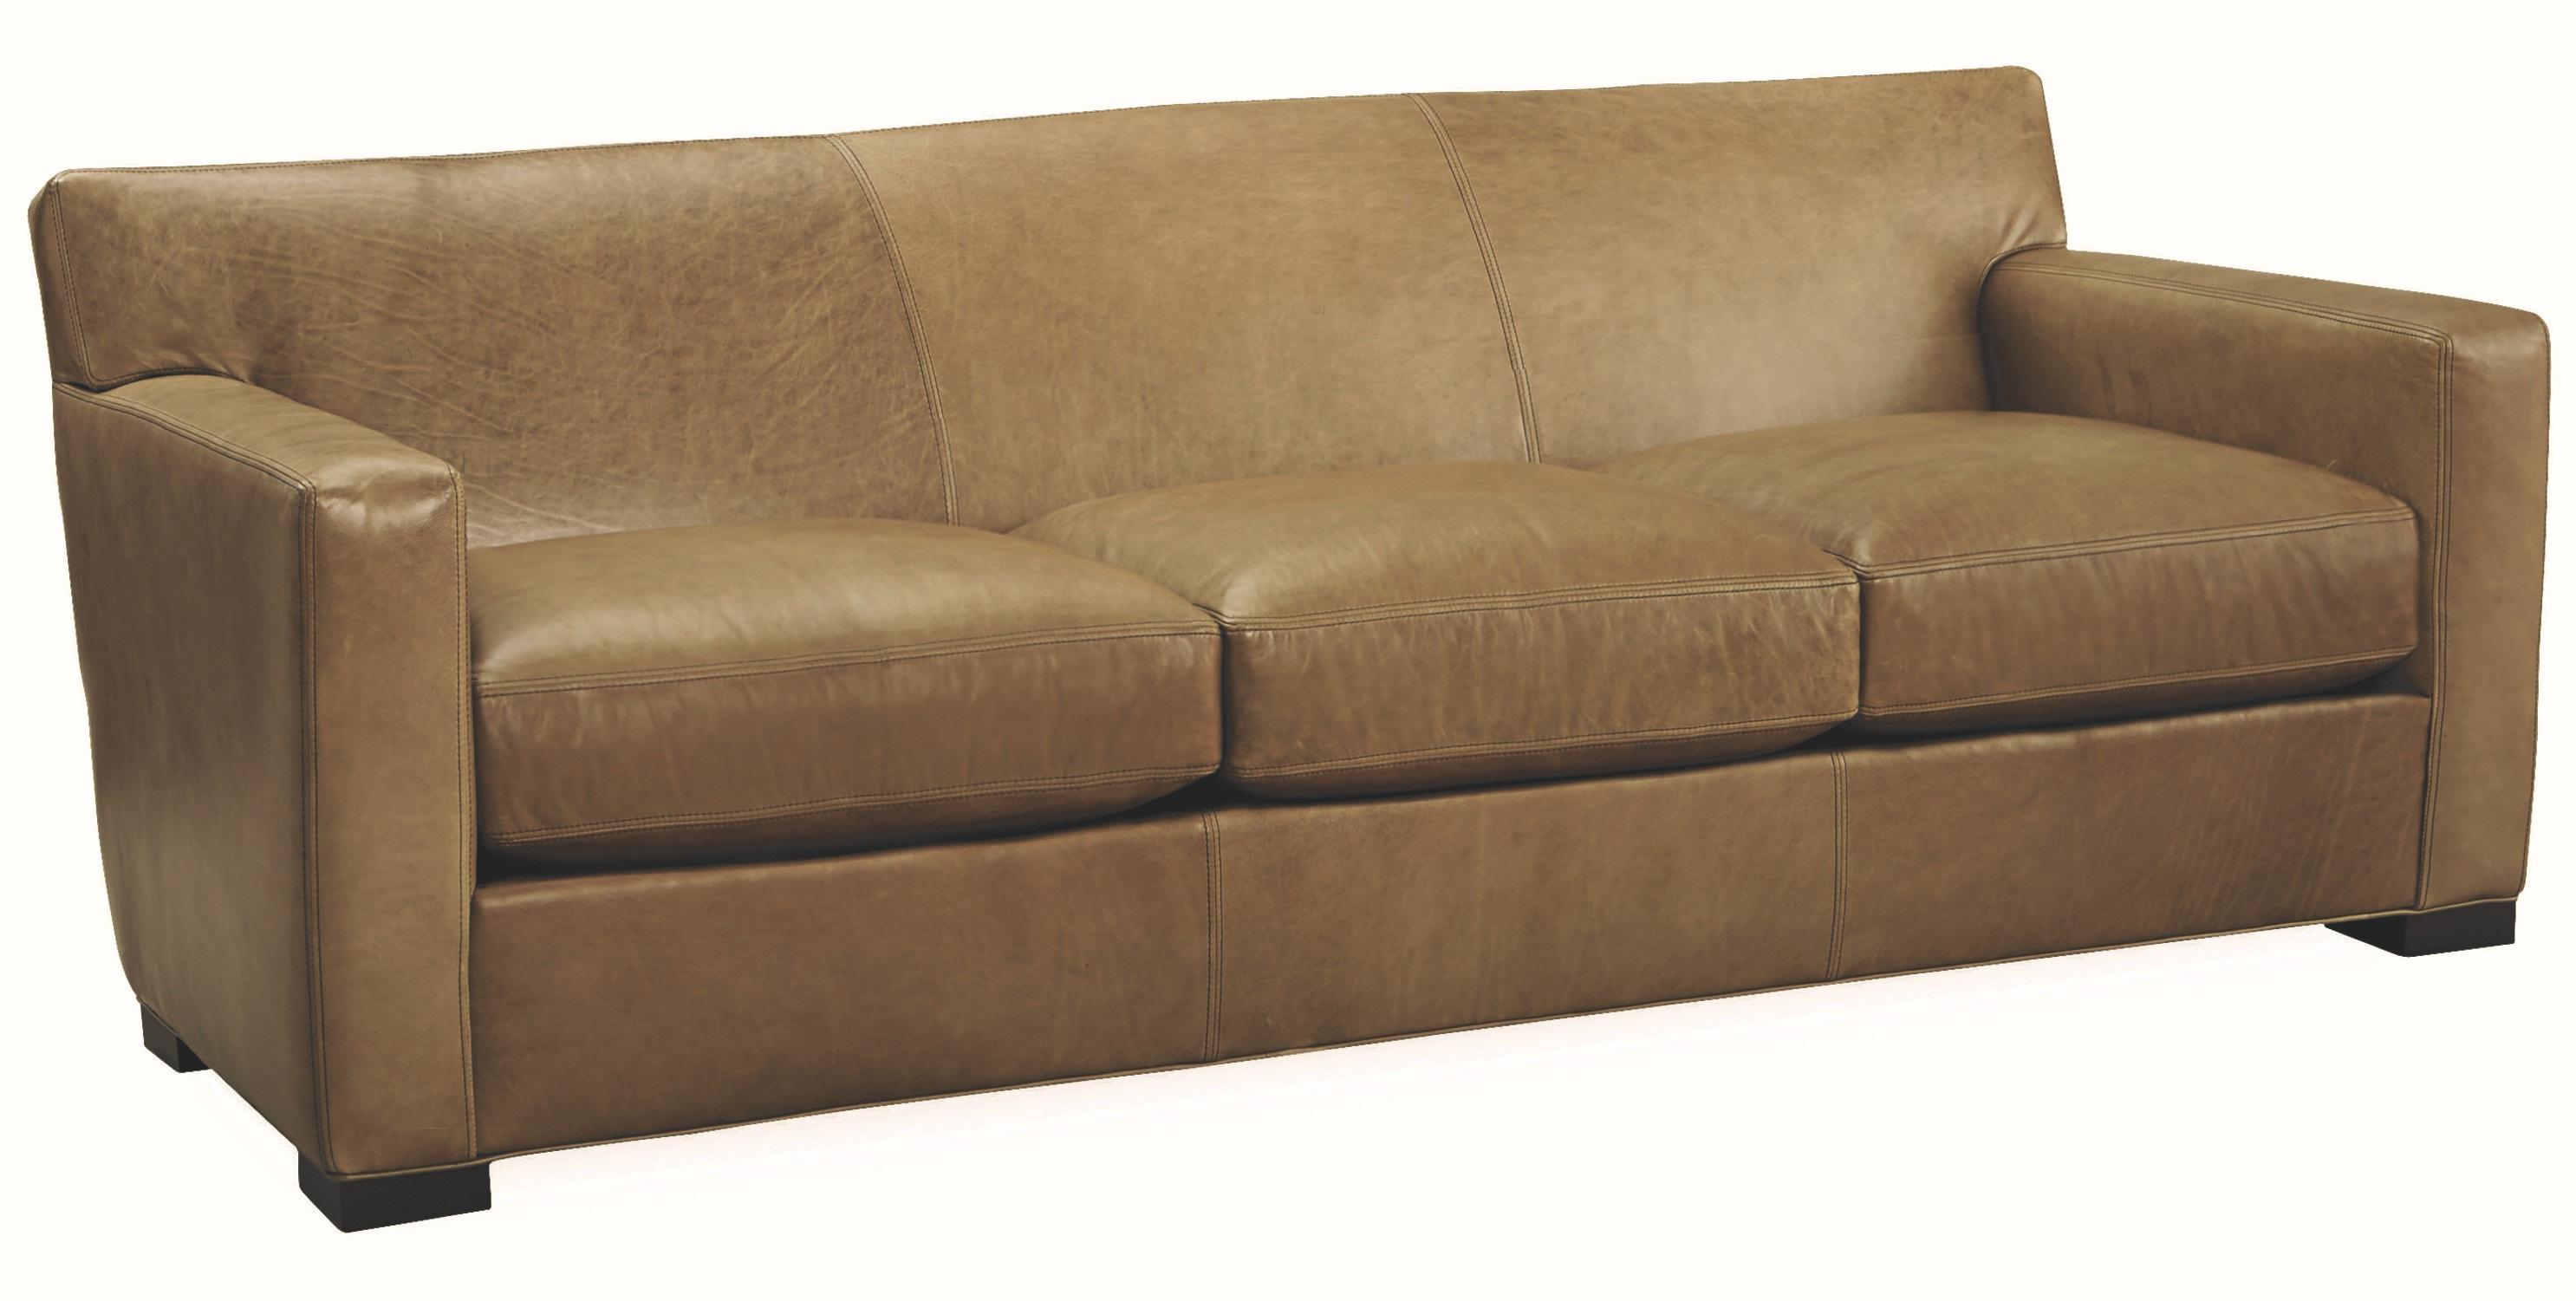 Genial Lee Industries Leather Sofa L3232 03